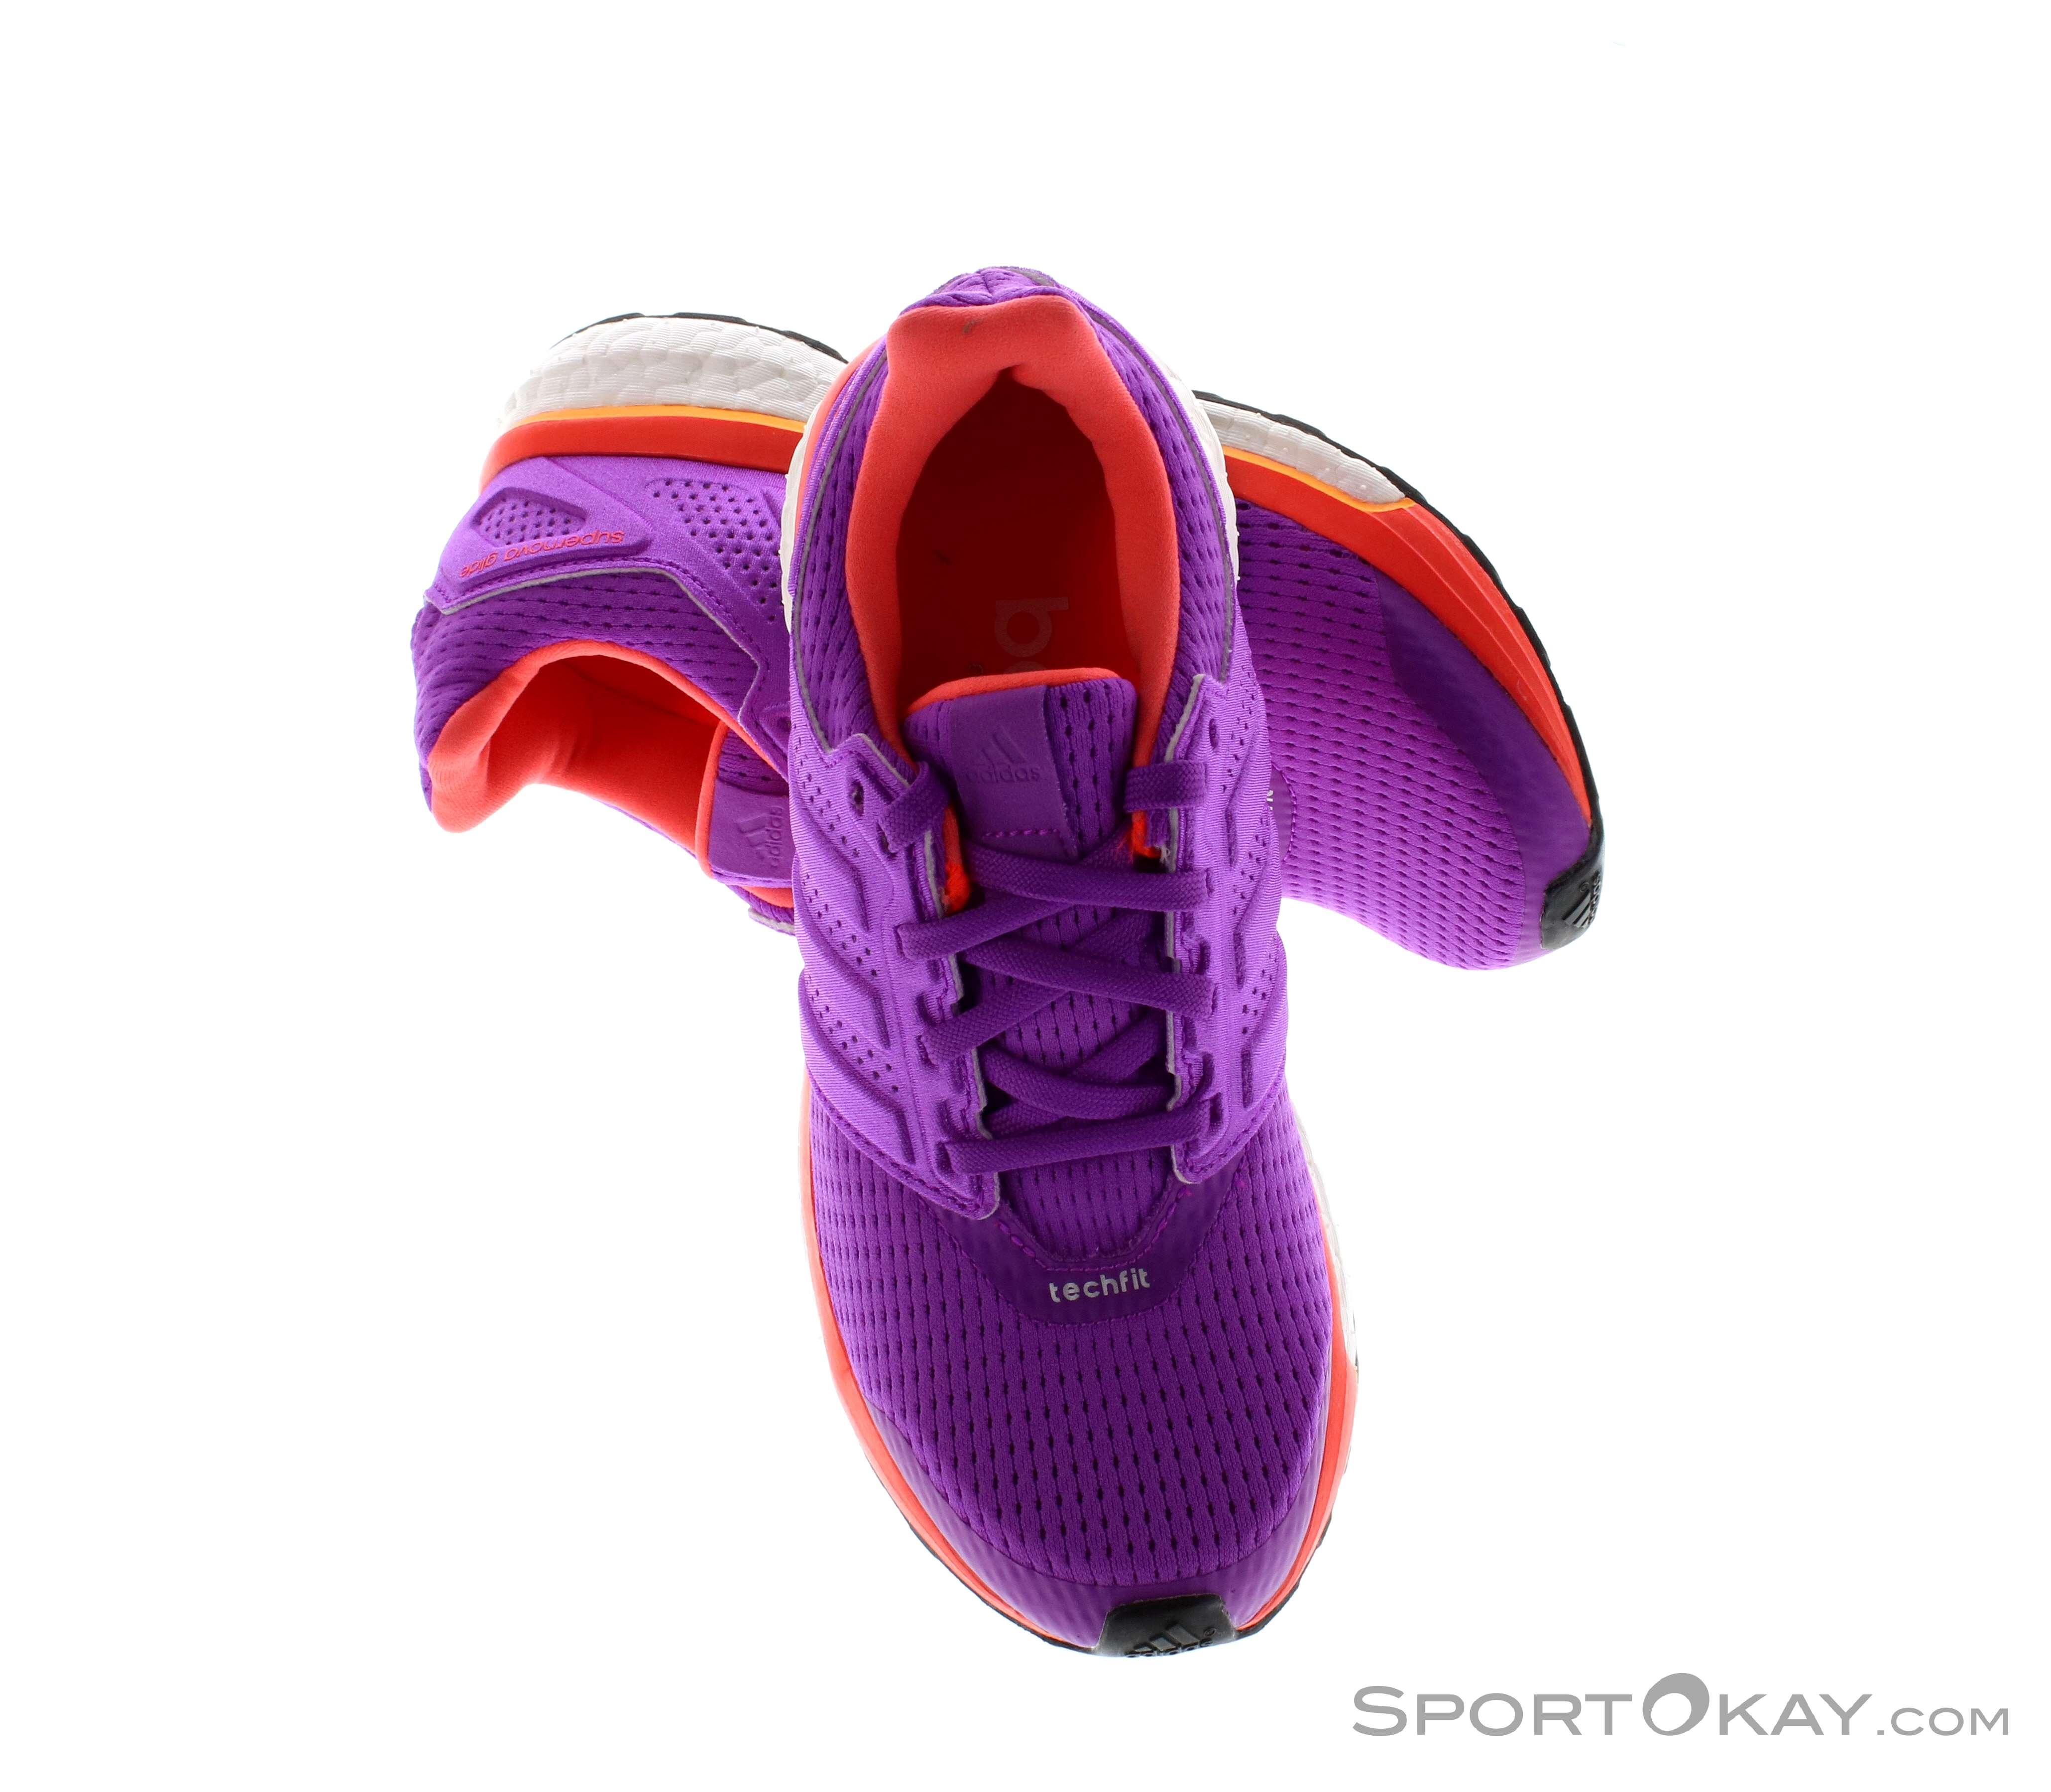 outlet store f8fa9 6af96 adidas Supernova Glide 8 Damen Laufschuhe, adidas, Lila, , Damen, 0002-